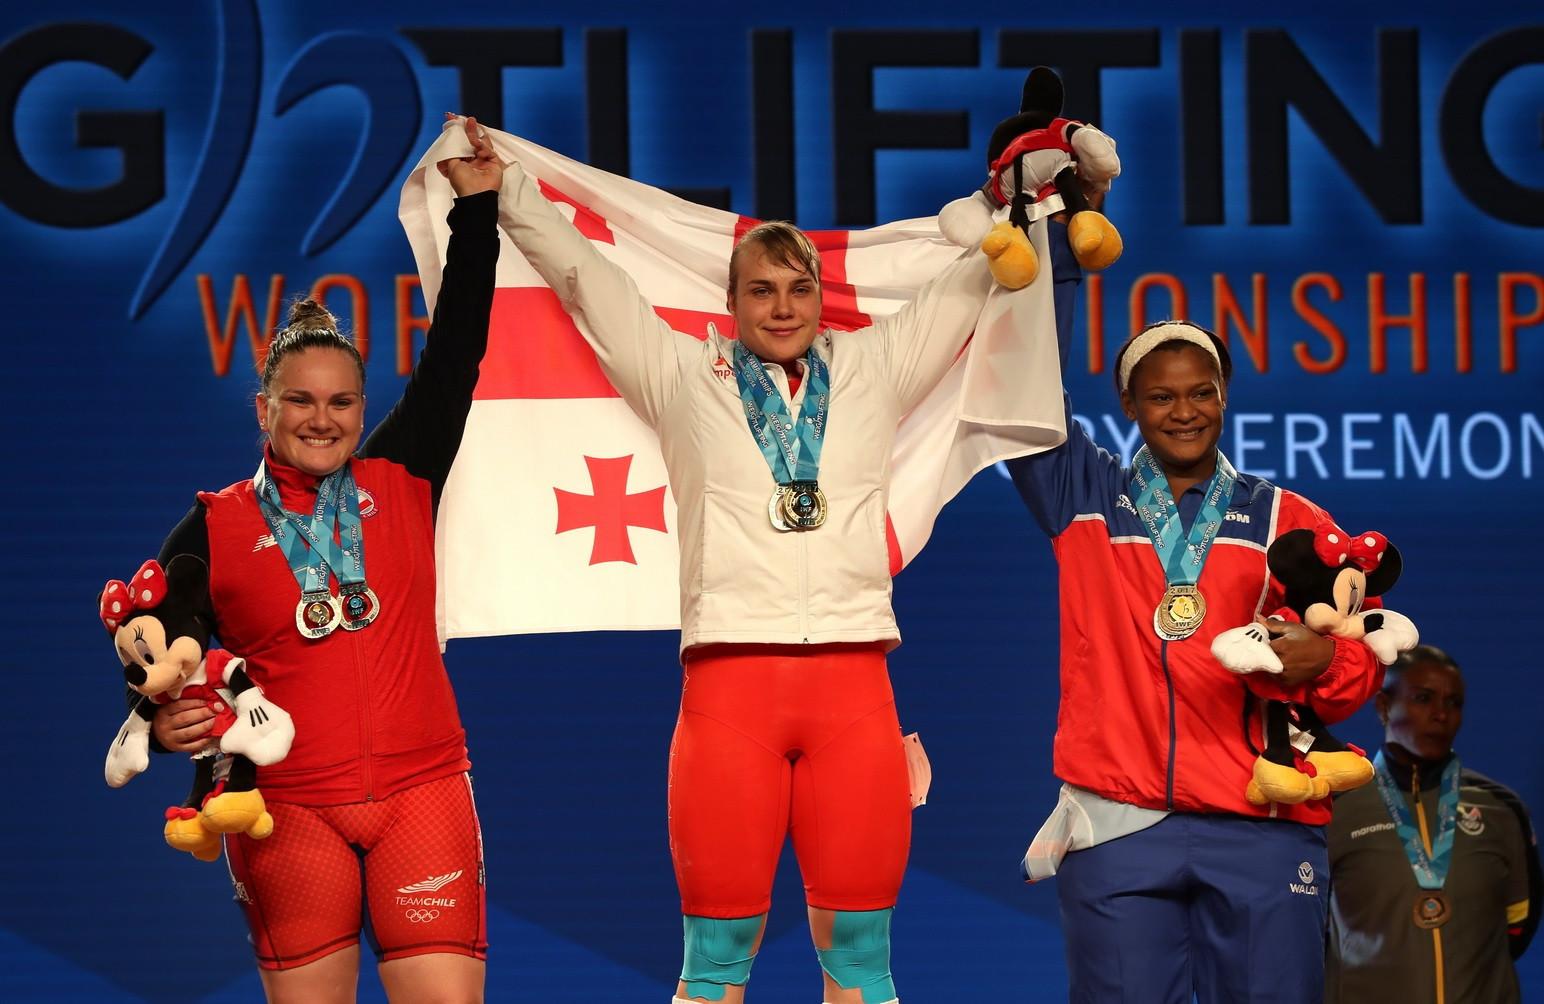 Hotfrid makes Georgian history with women's 90kg success at 2017 IWF World Championships